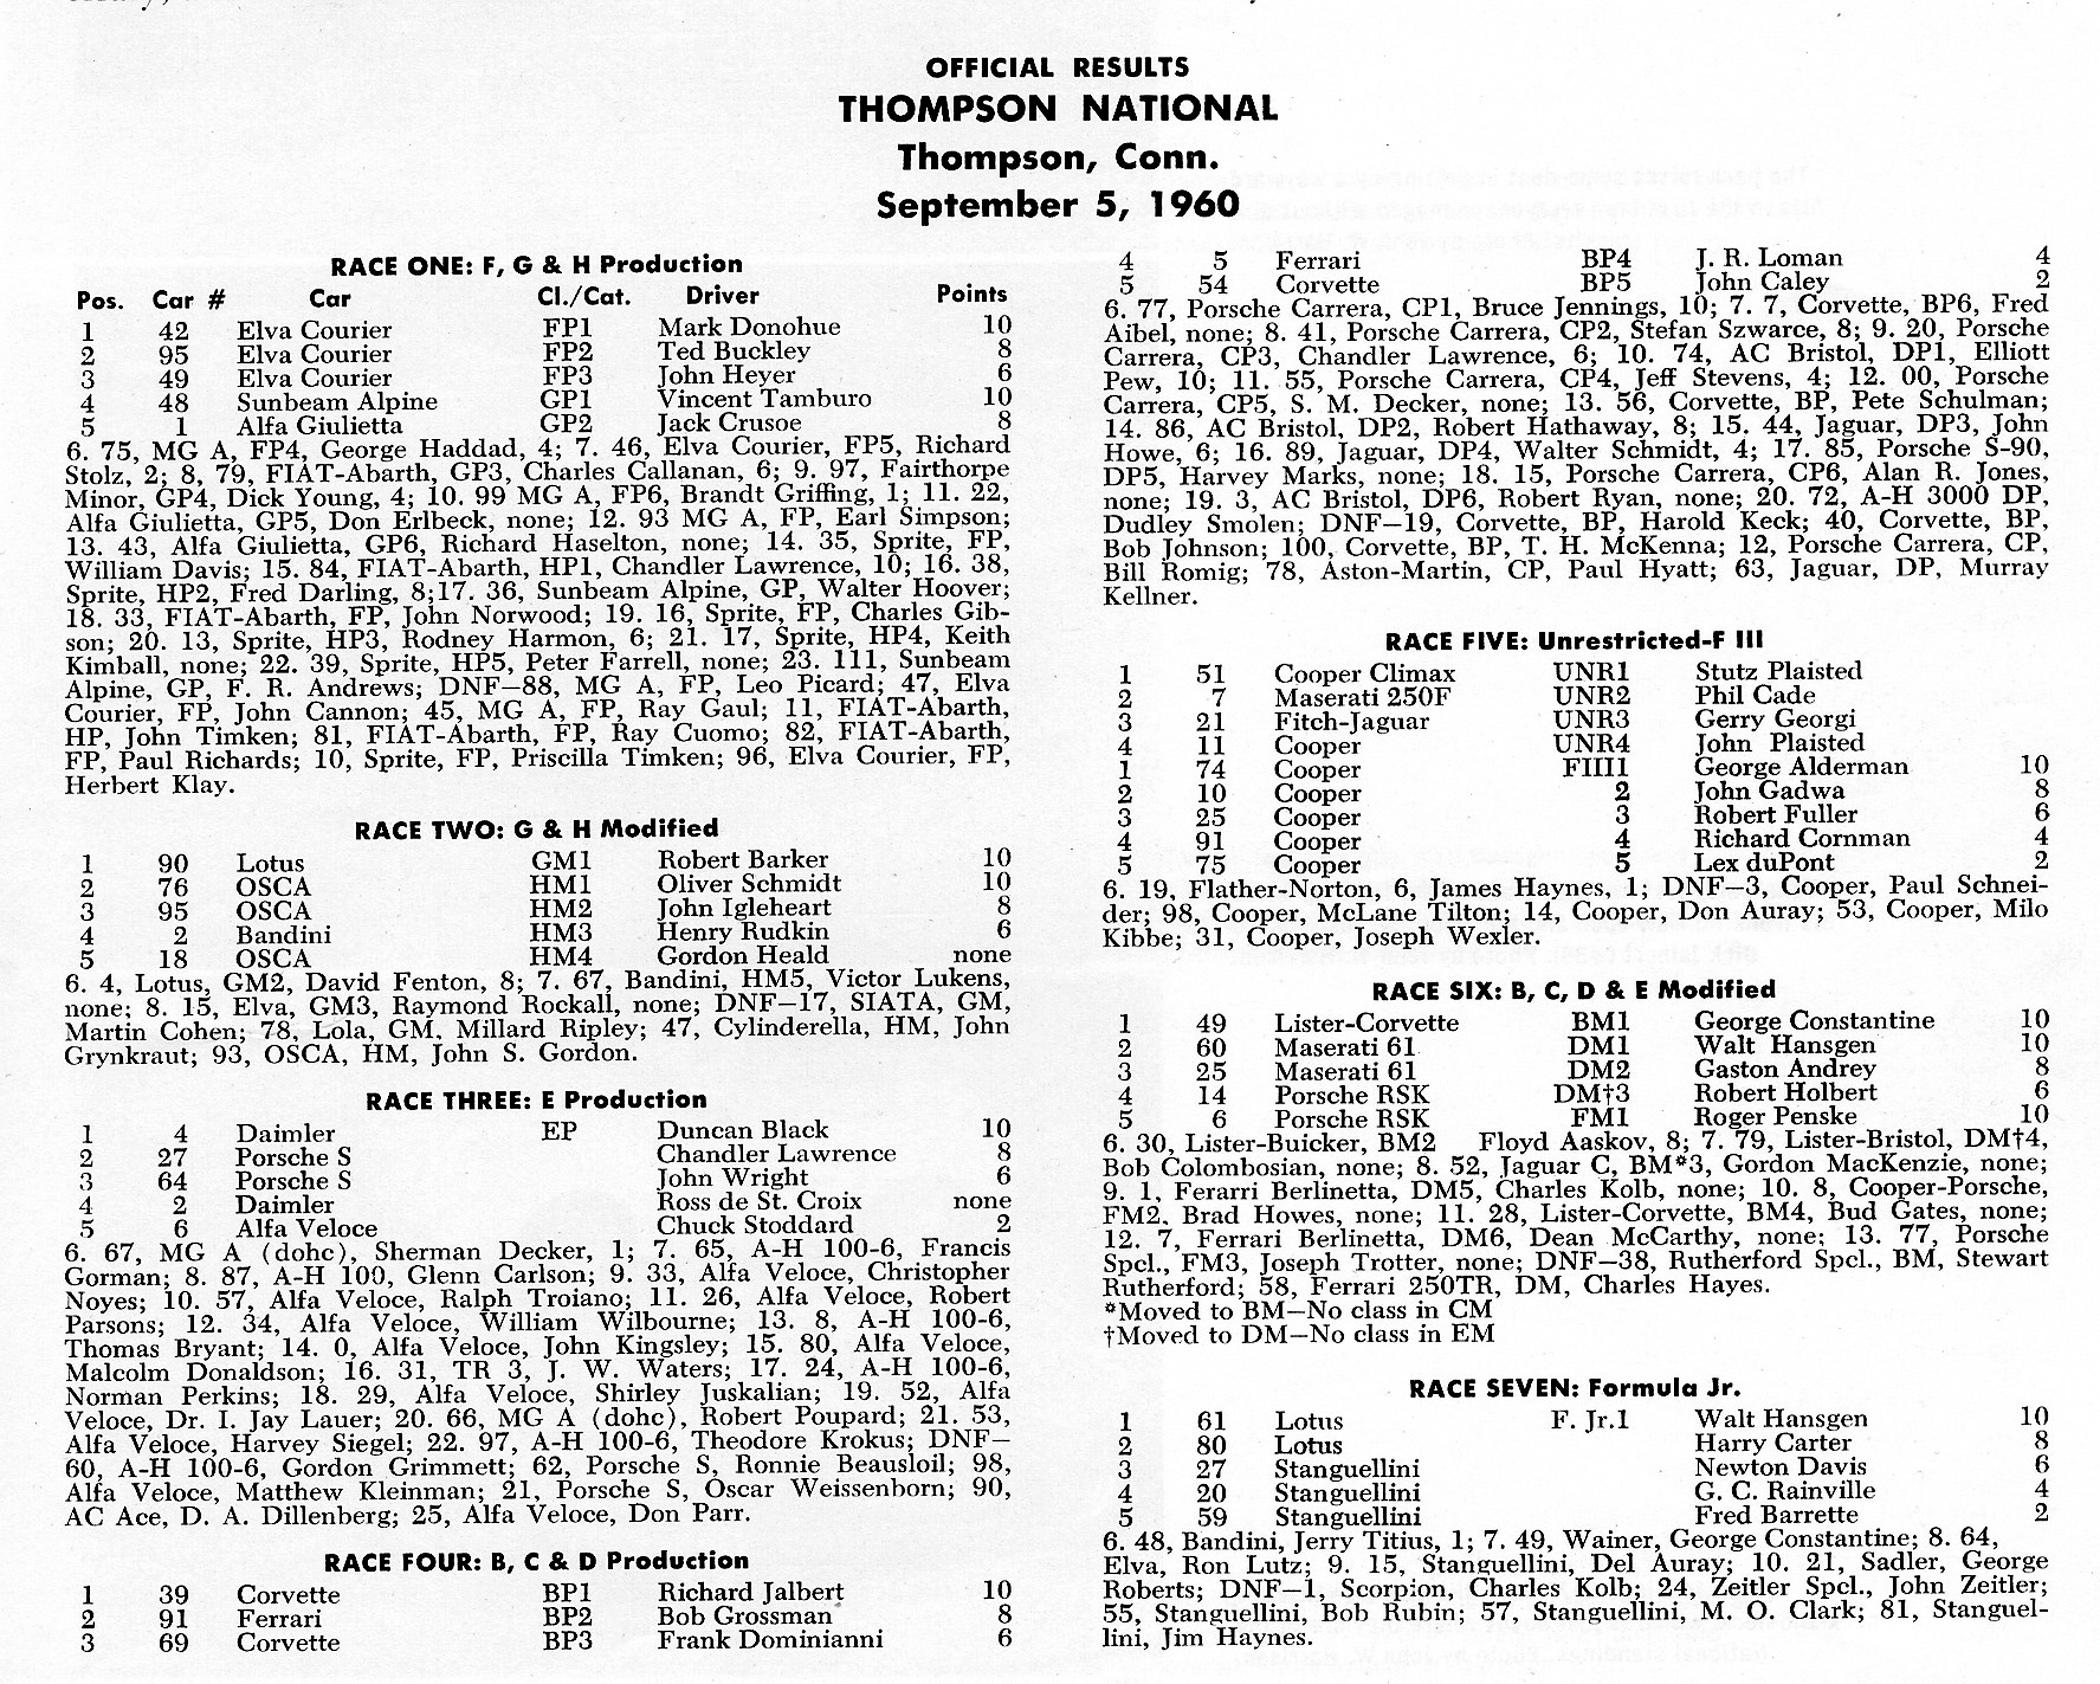 60 Thompson BARCboys.jpg